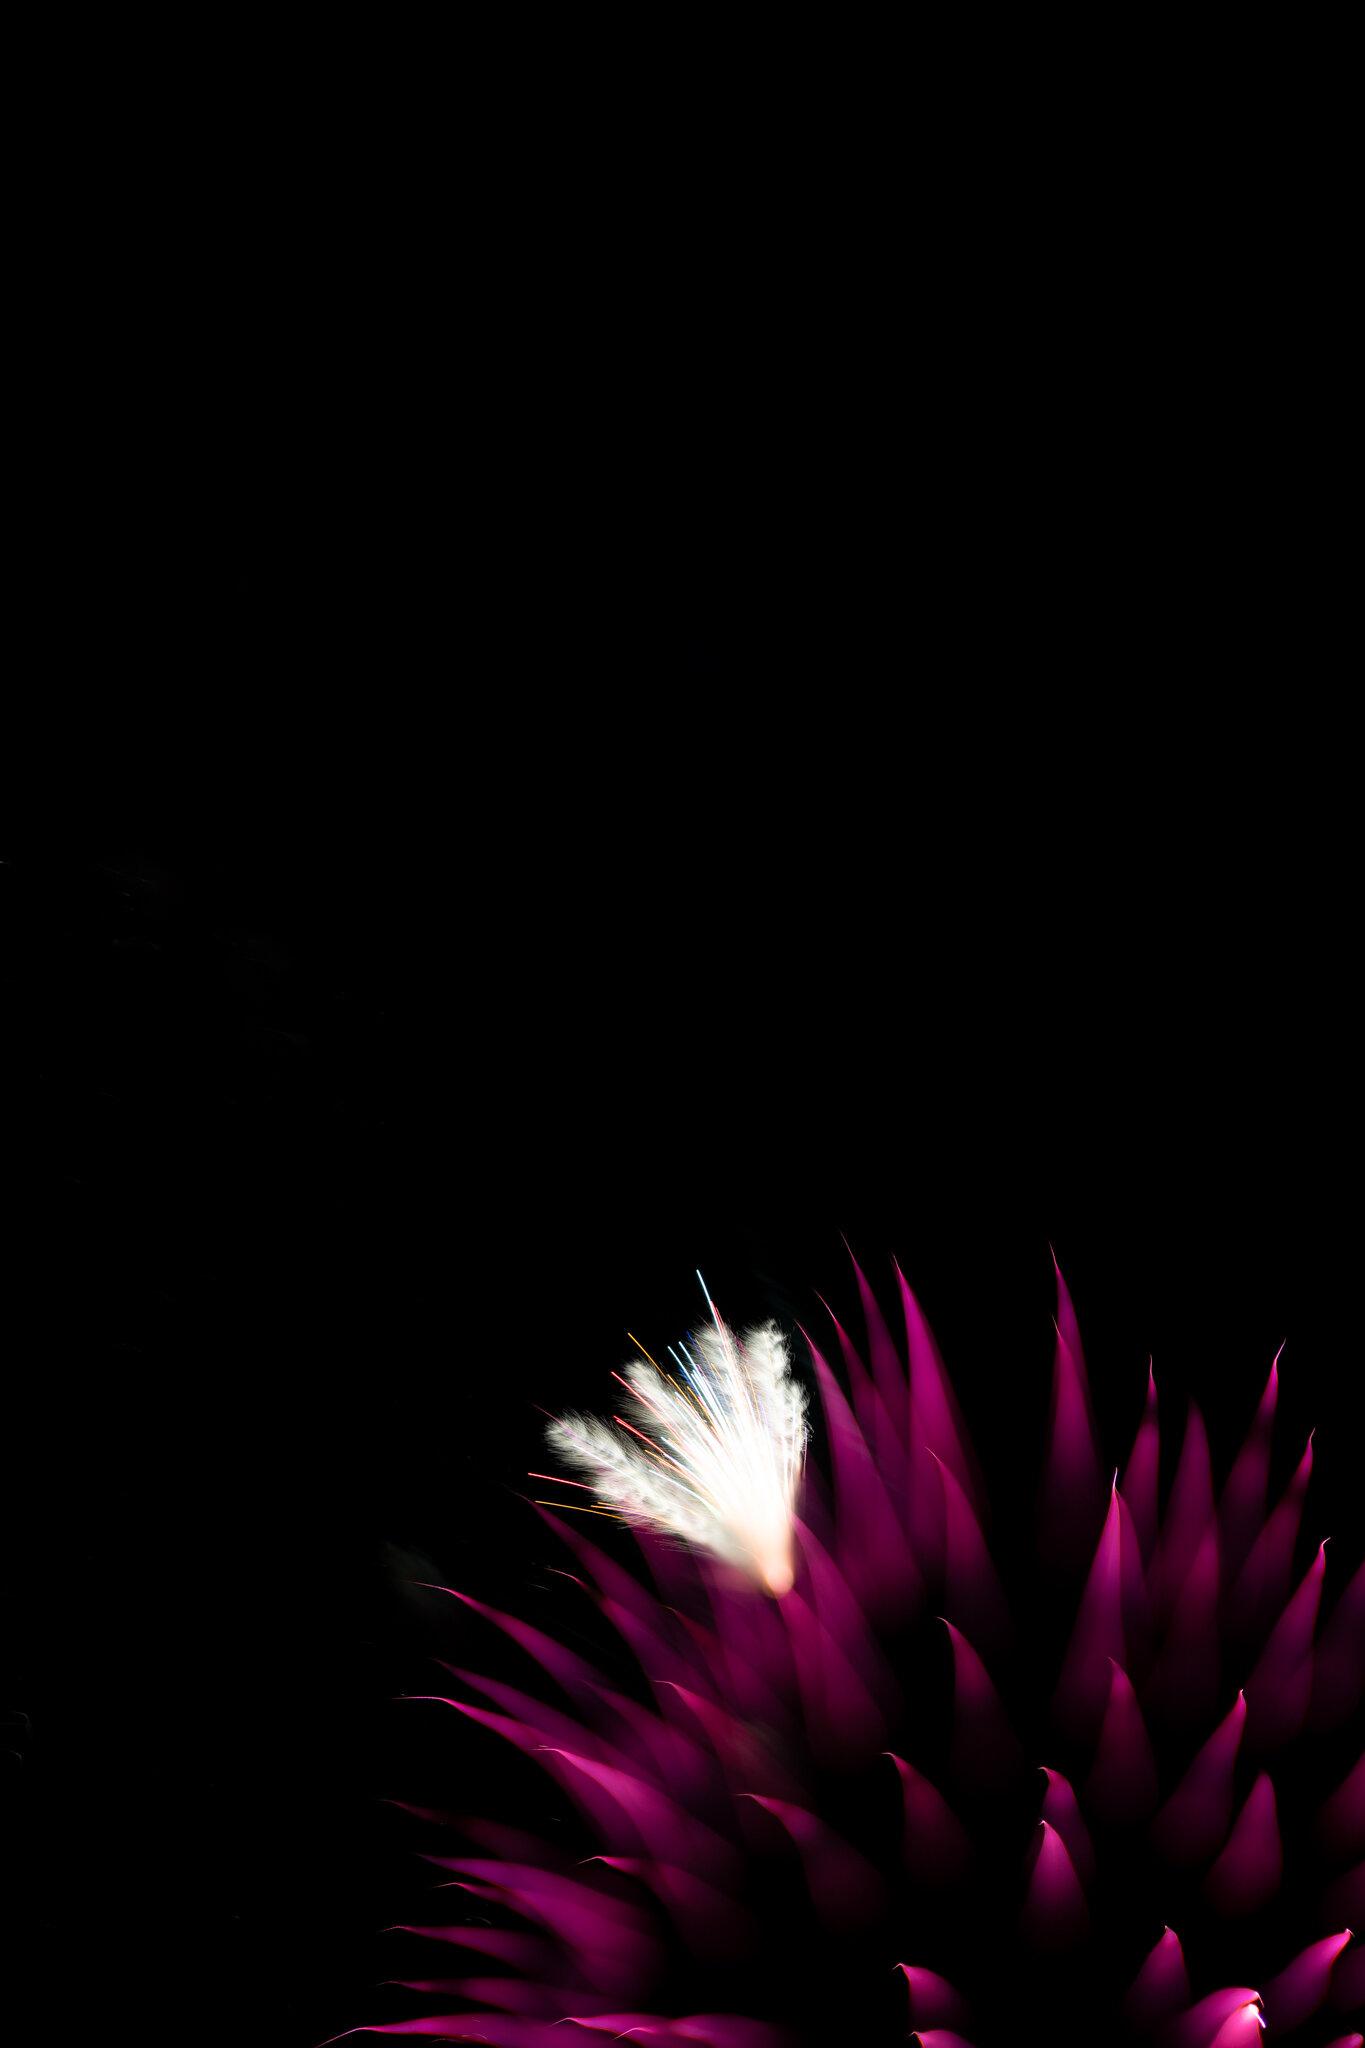 focuspulledfireworks-9.jpg